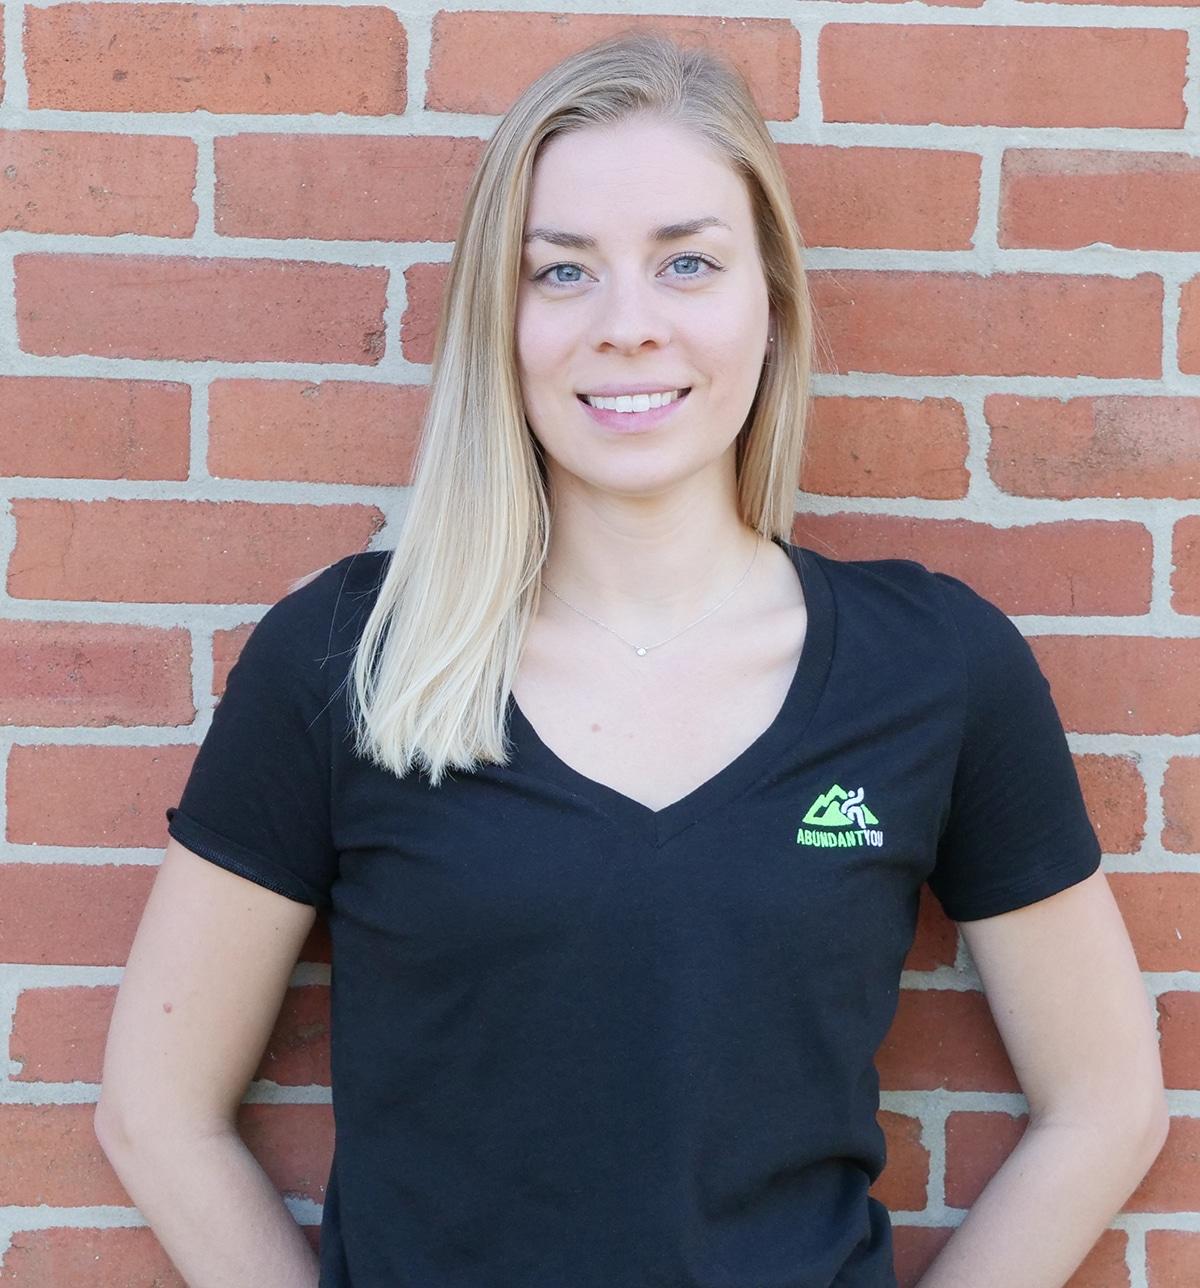 Dallas Holistic Nutritionist at Abundant You Chiropractic & Wellness